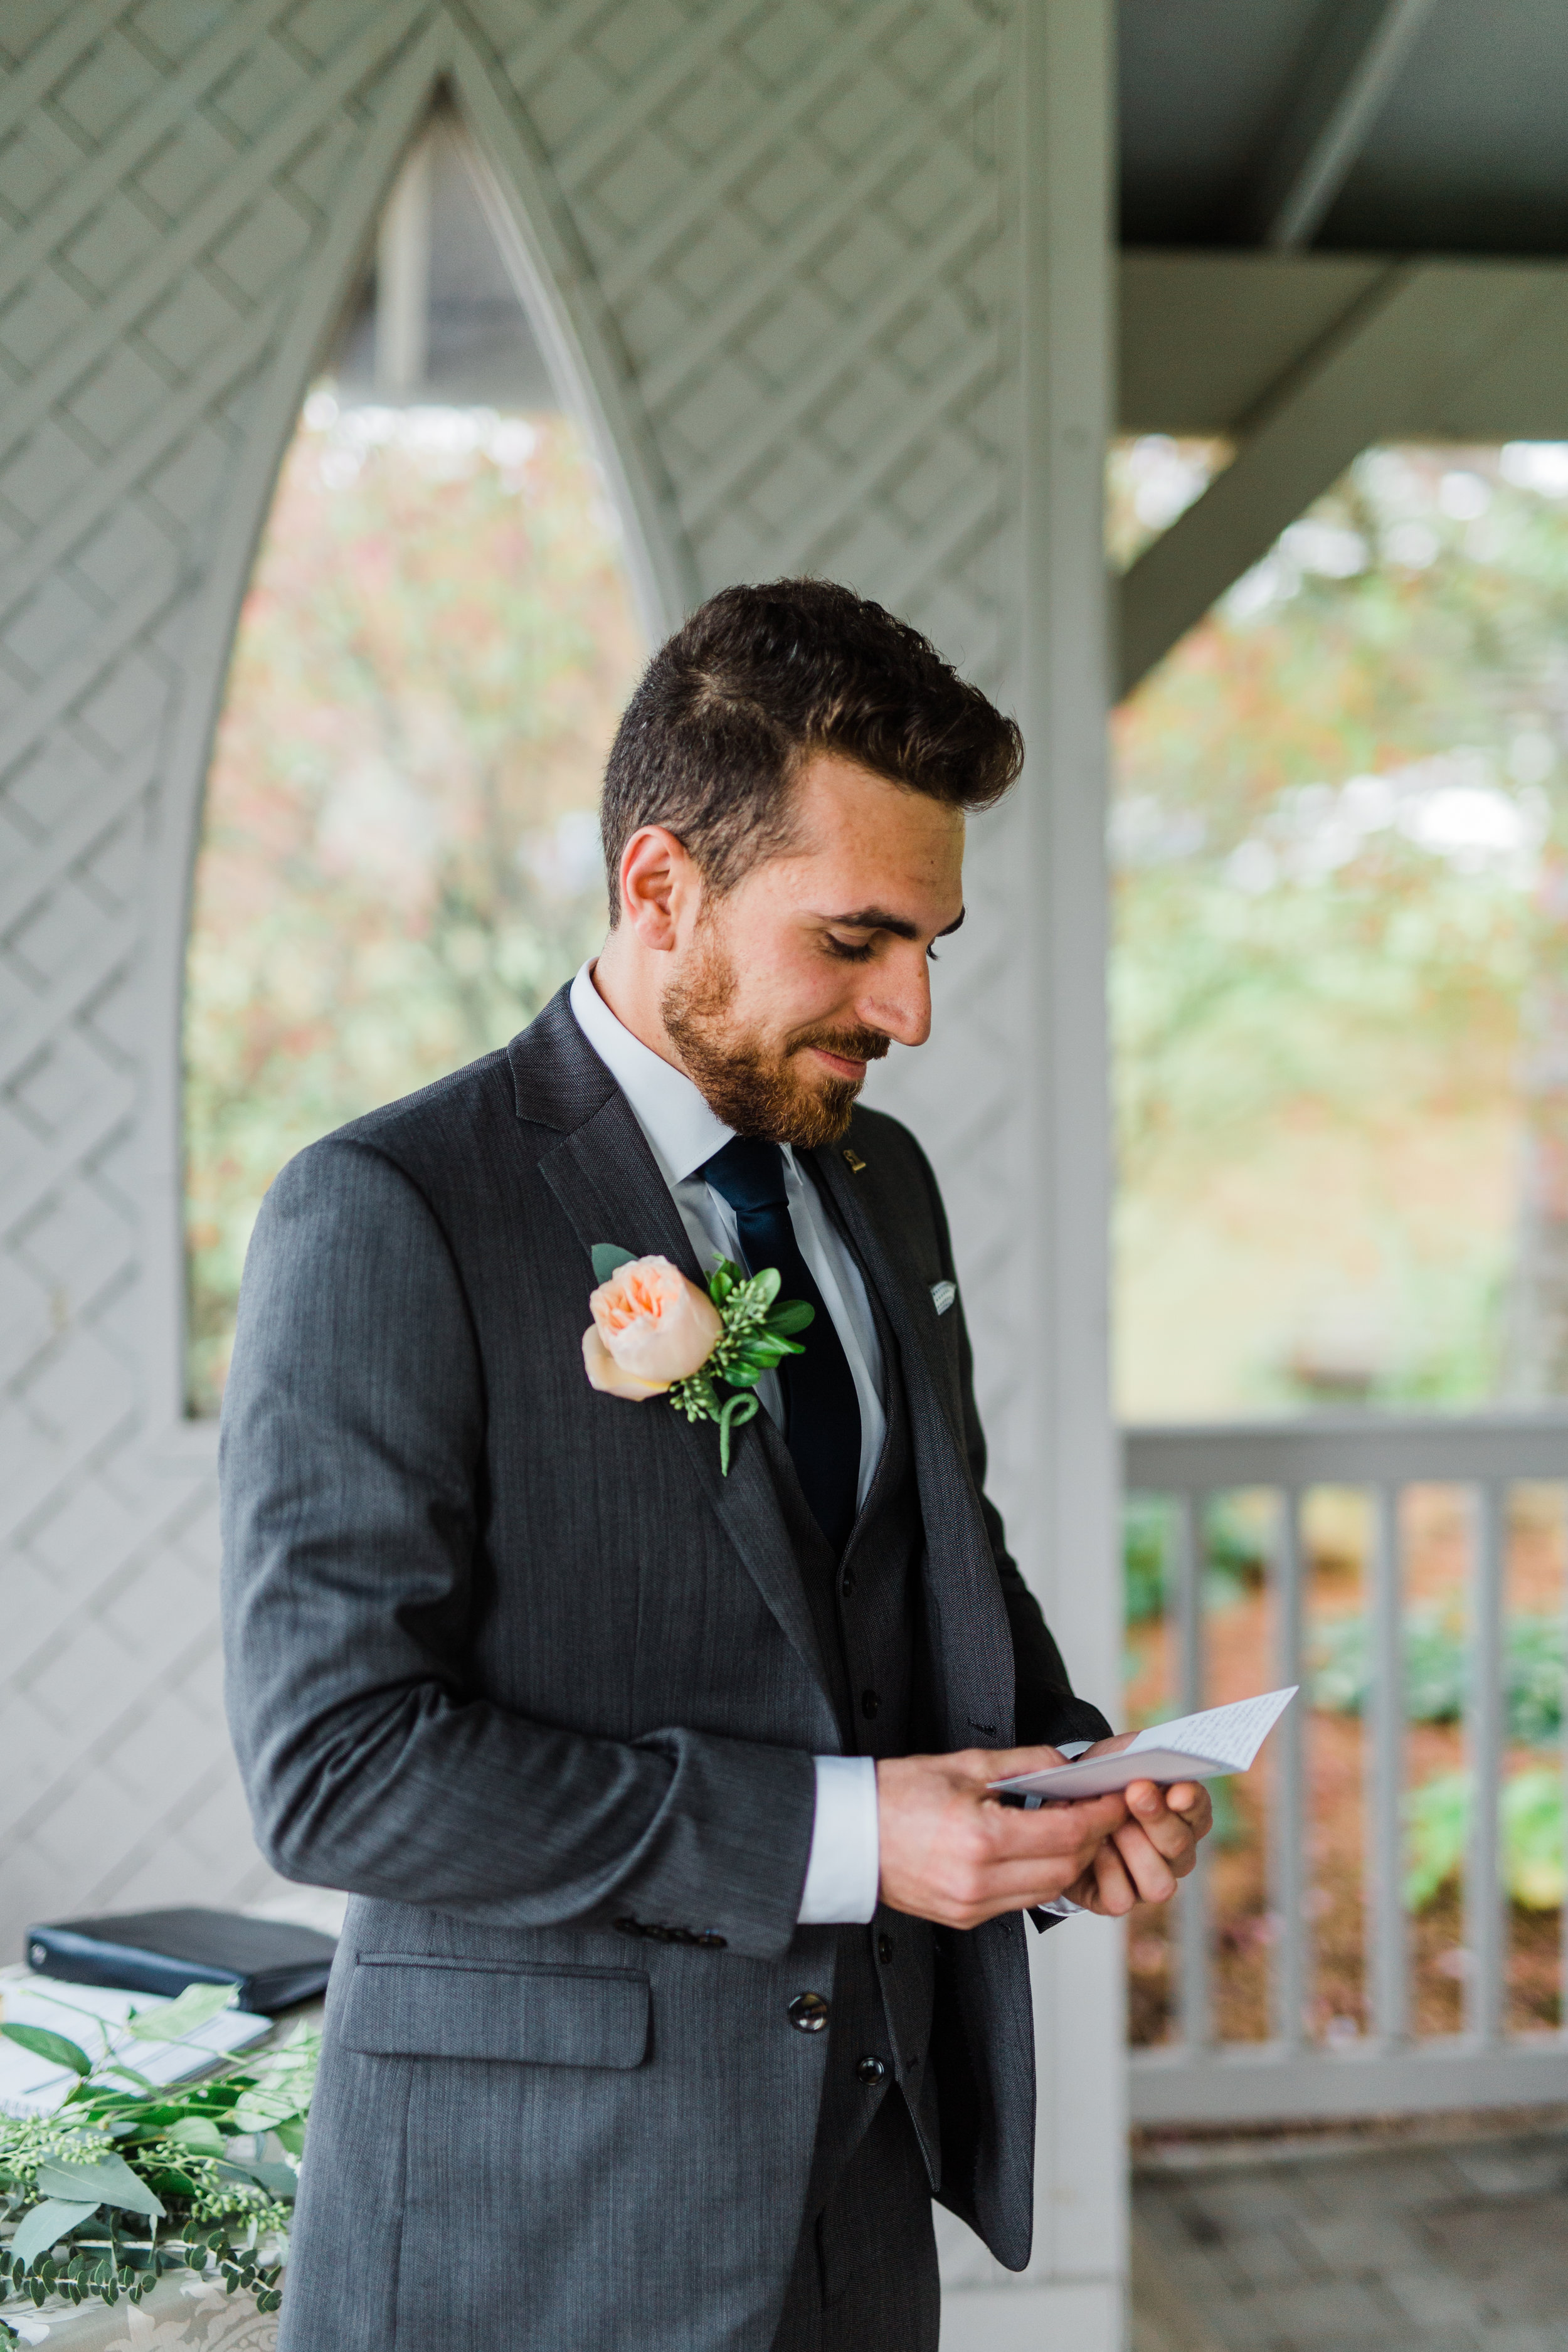 Amir-Golbazi-Danielle-Giroux-Photography_Toronto-Wedding_Cedarwood_Rachel-Paul_131.jpg